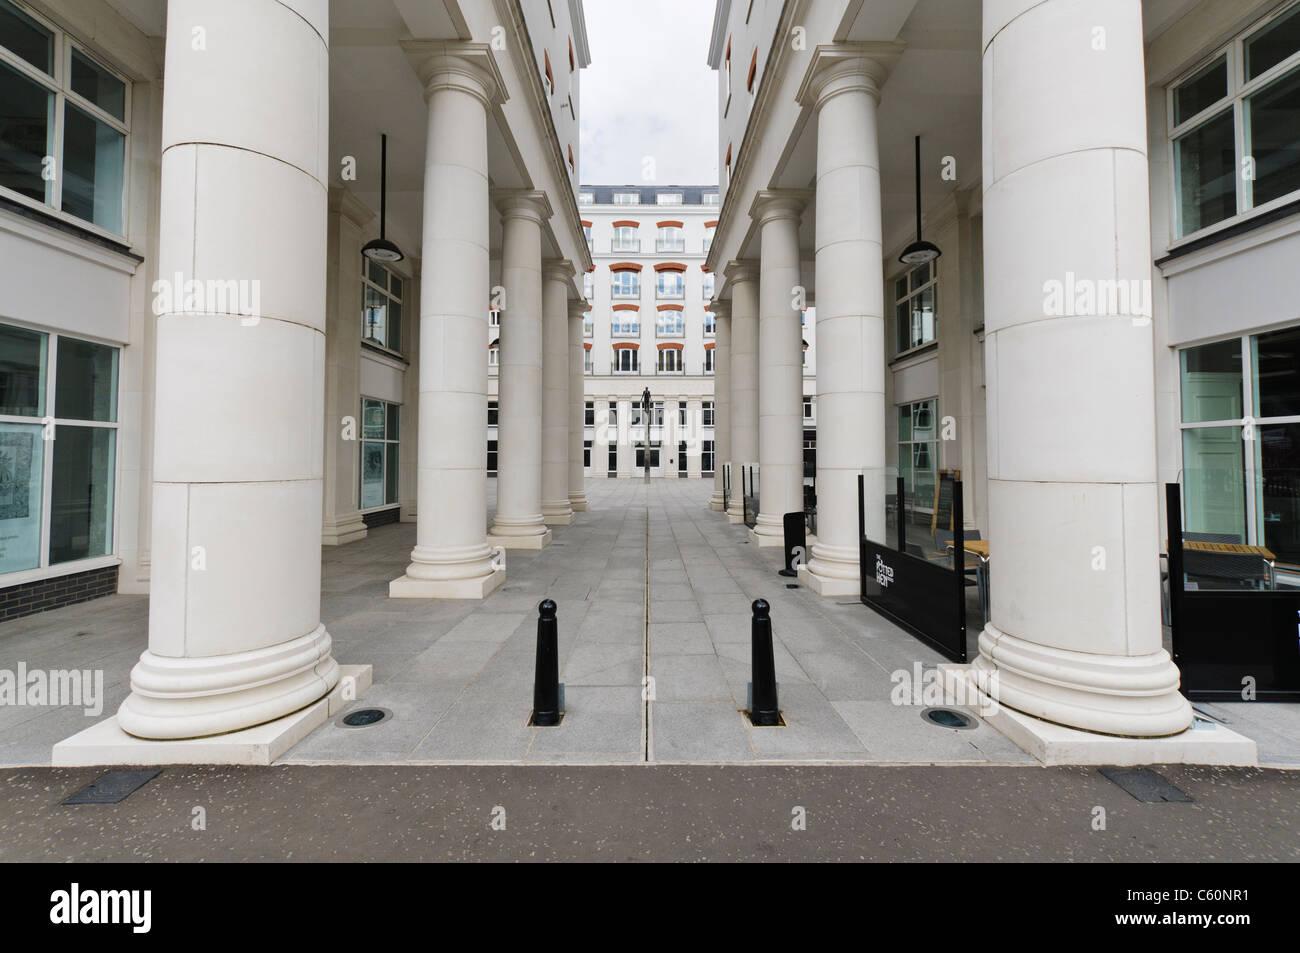 Saint Anne's Square, Belfast - Stock Image